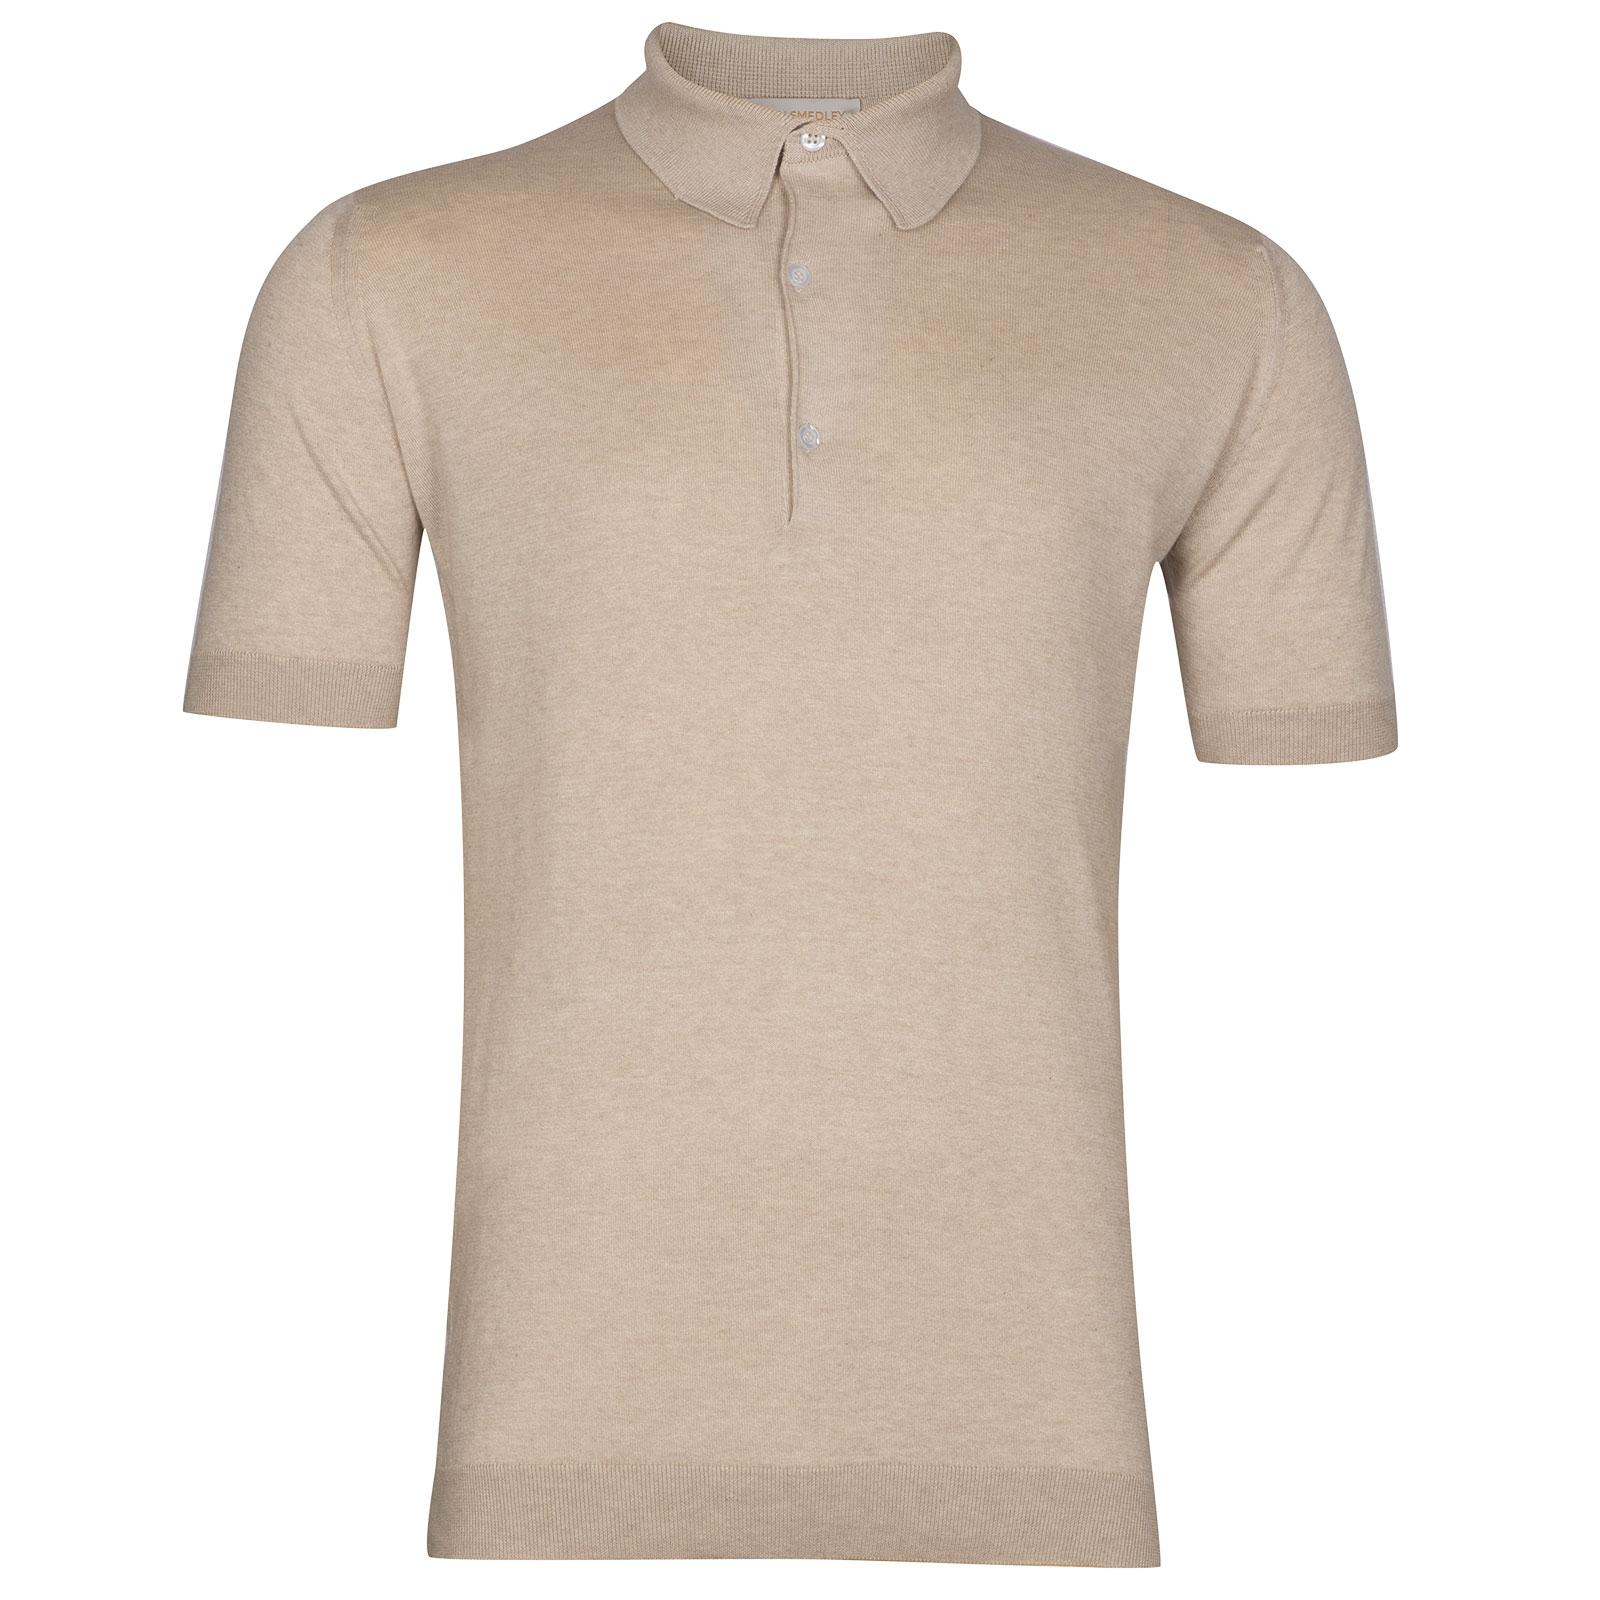 John Smedley Haddon in Sandstone Shirt-XXL